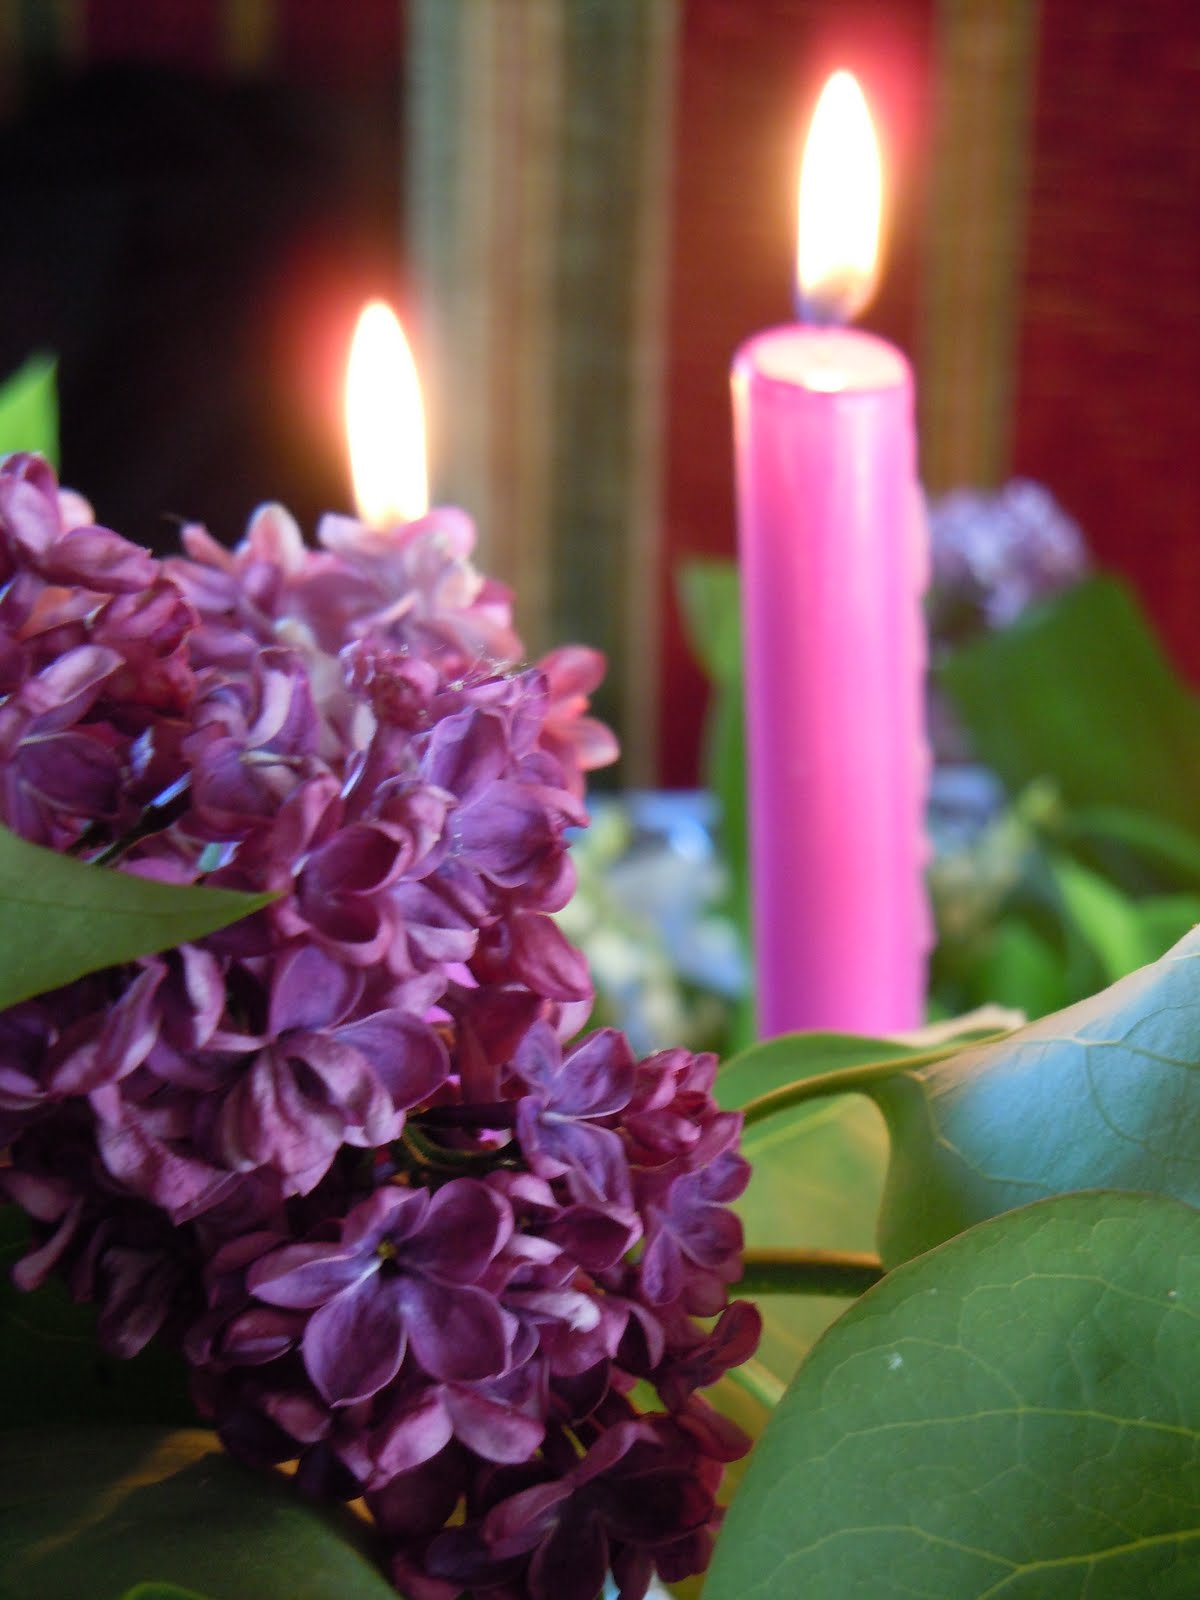 lylou anne collection ma table muguet couleur lilas. Black Bedroom Furniture Sets. Home Design Ideas